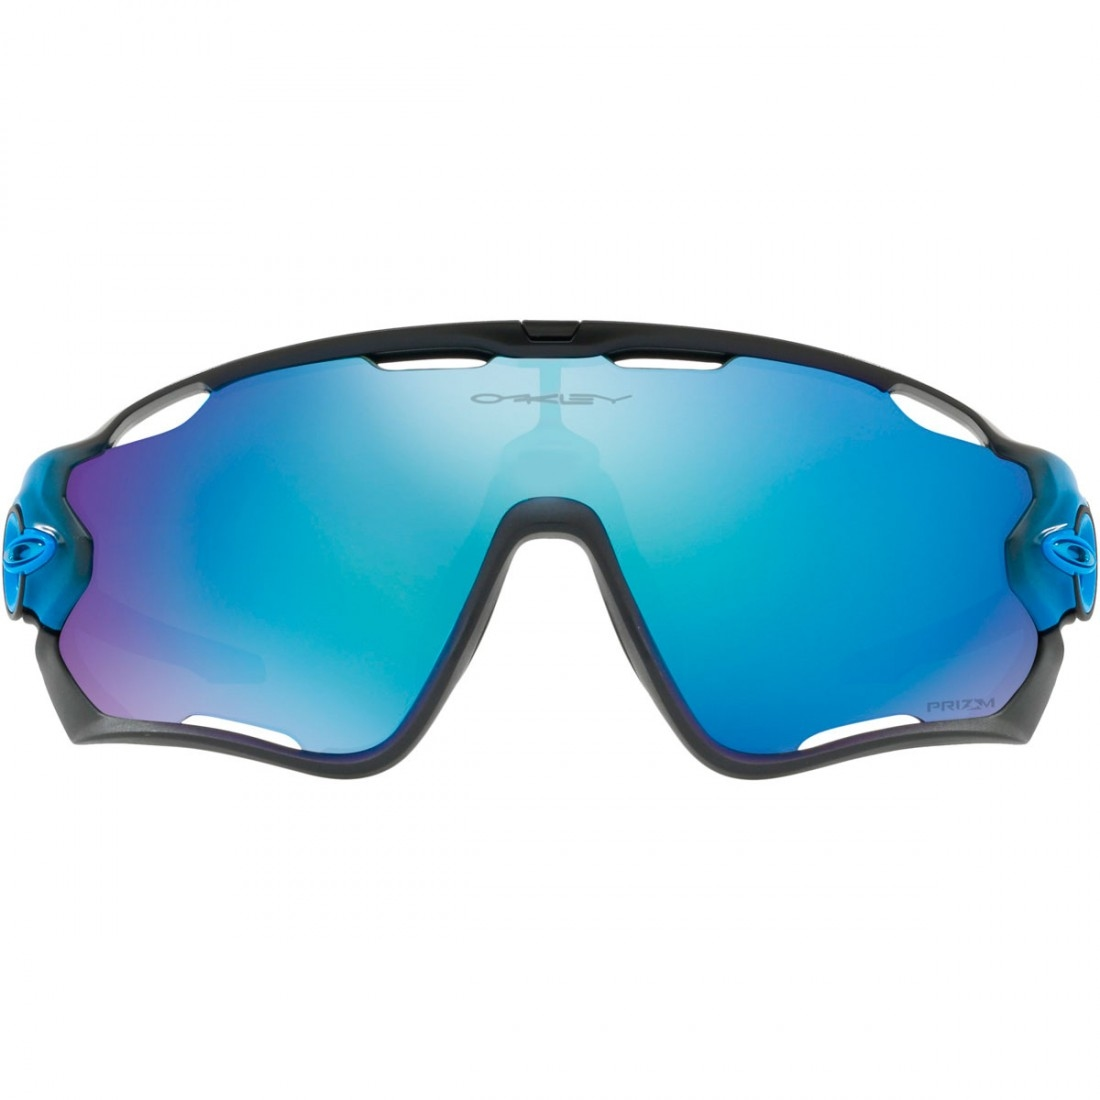 01fb35eeee OAKLEY Jawbreaker Sapphire Fade Collection   Prizm Sapphire Polarized Mask    Goggle